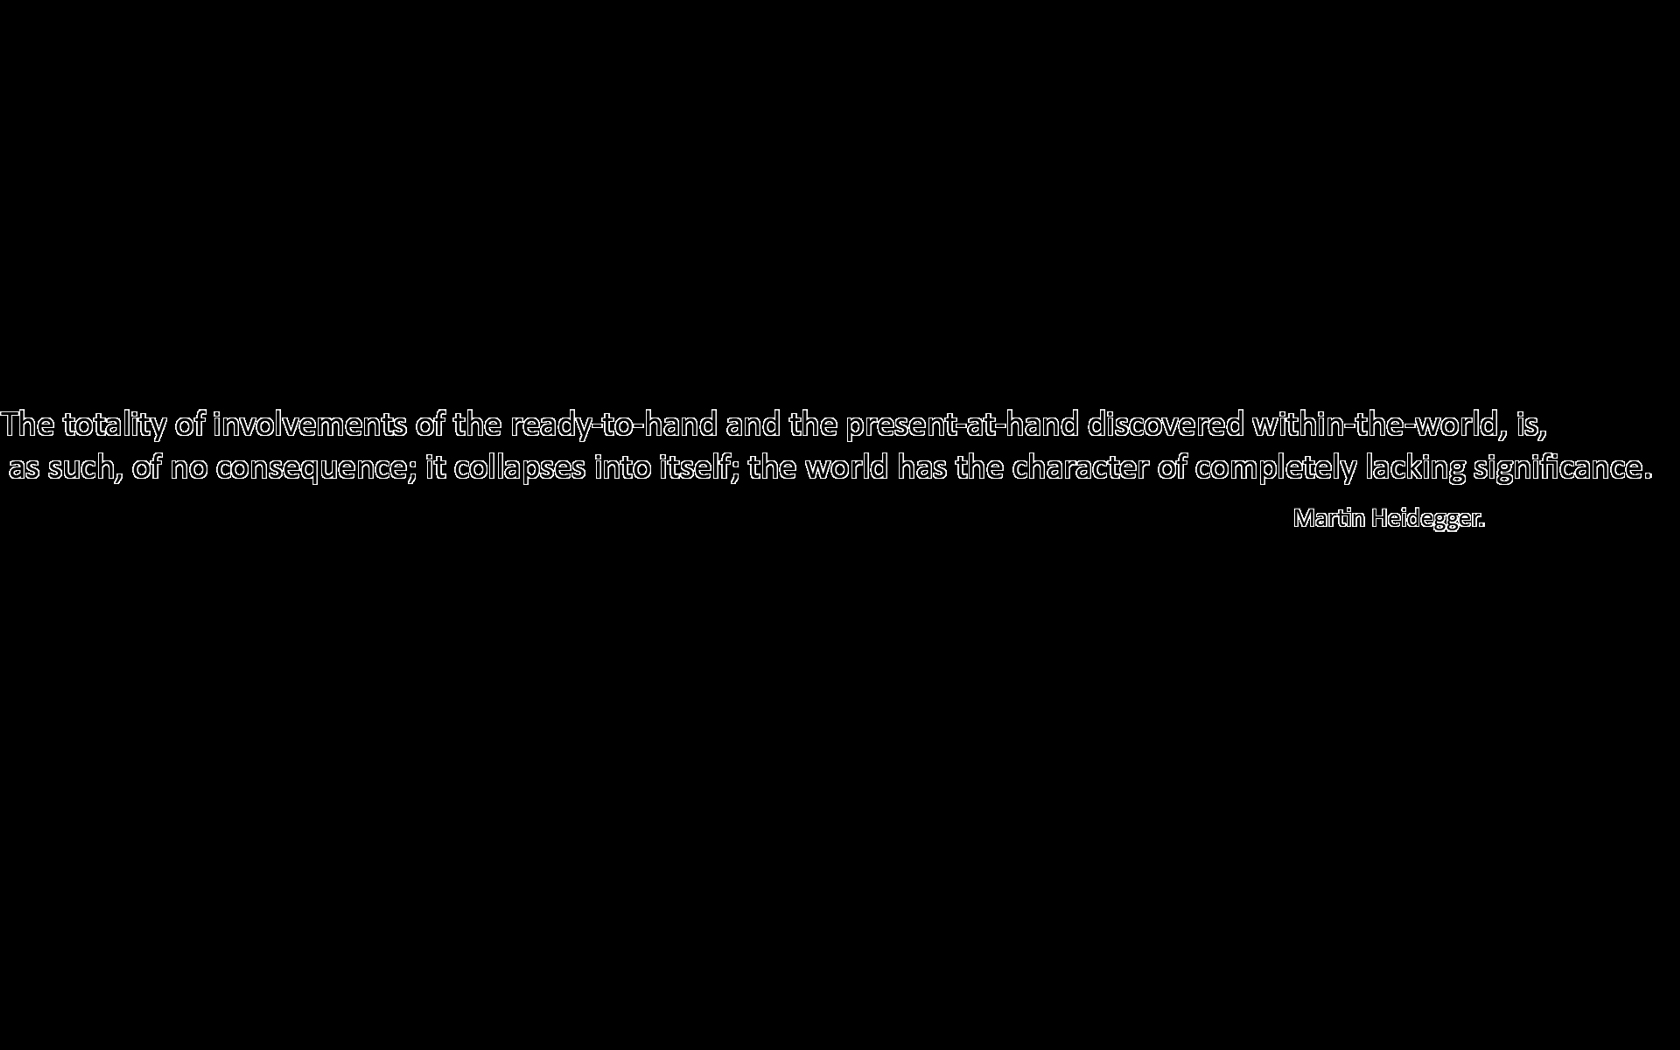 Martin Heidegger's quote #3